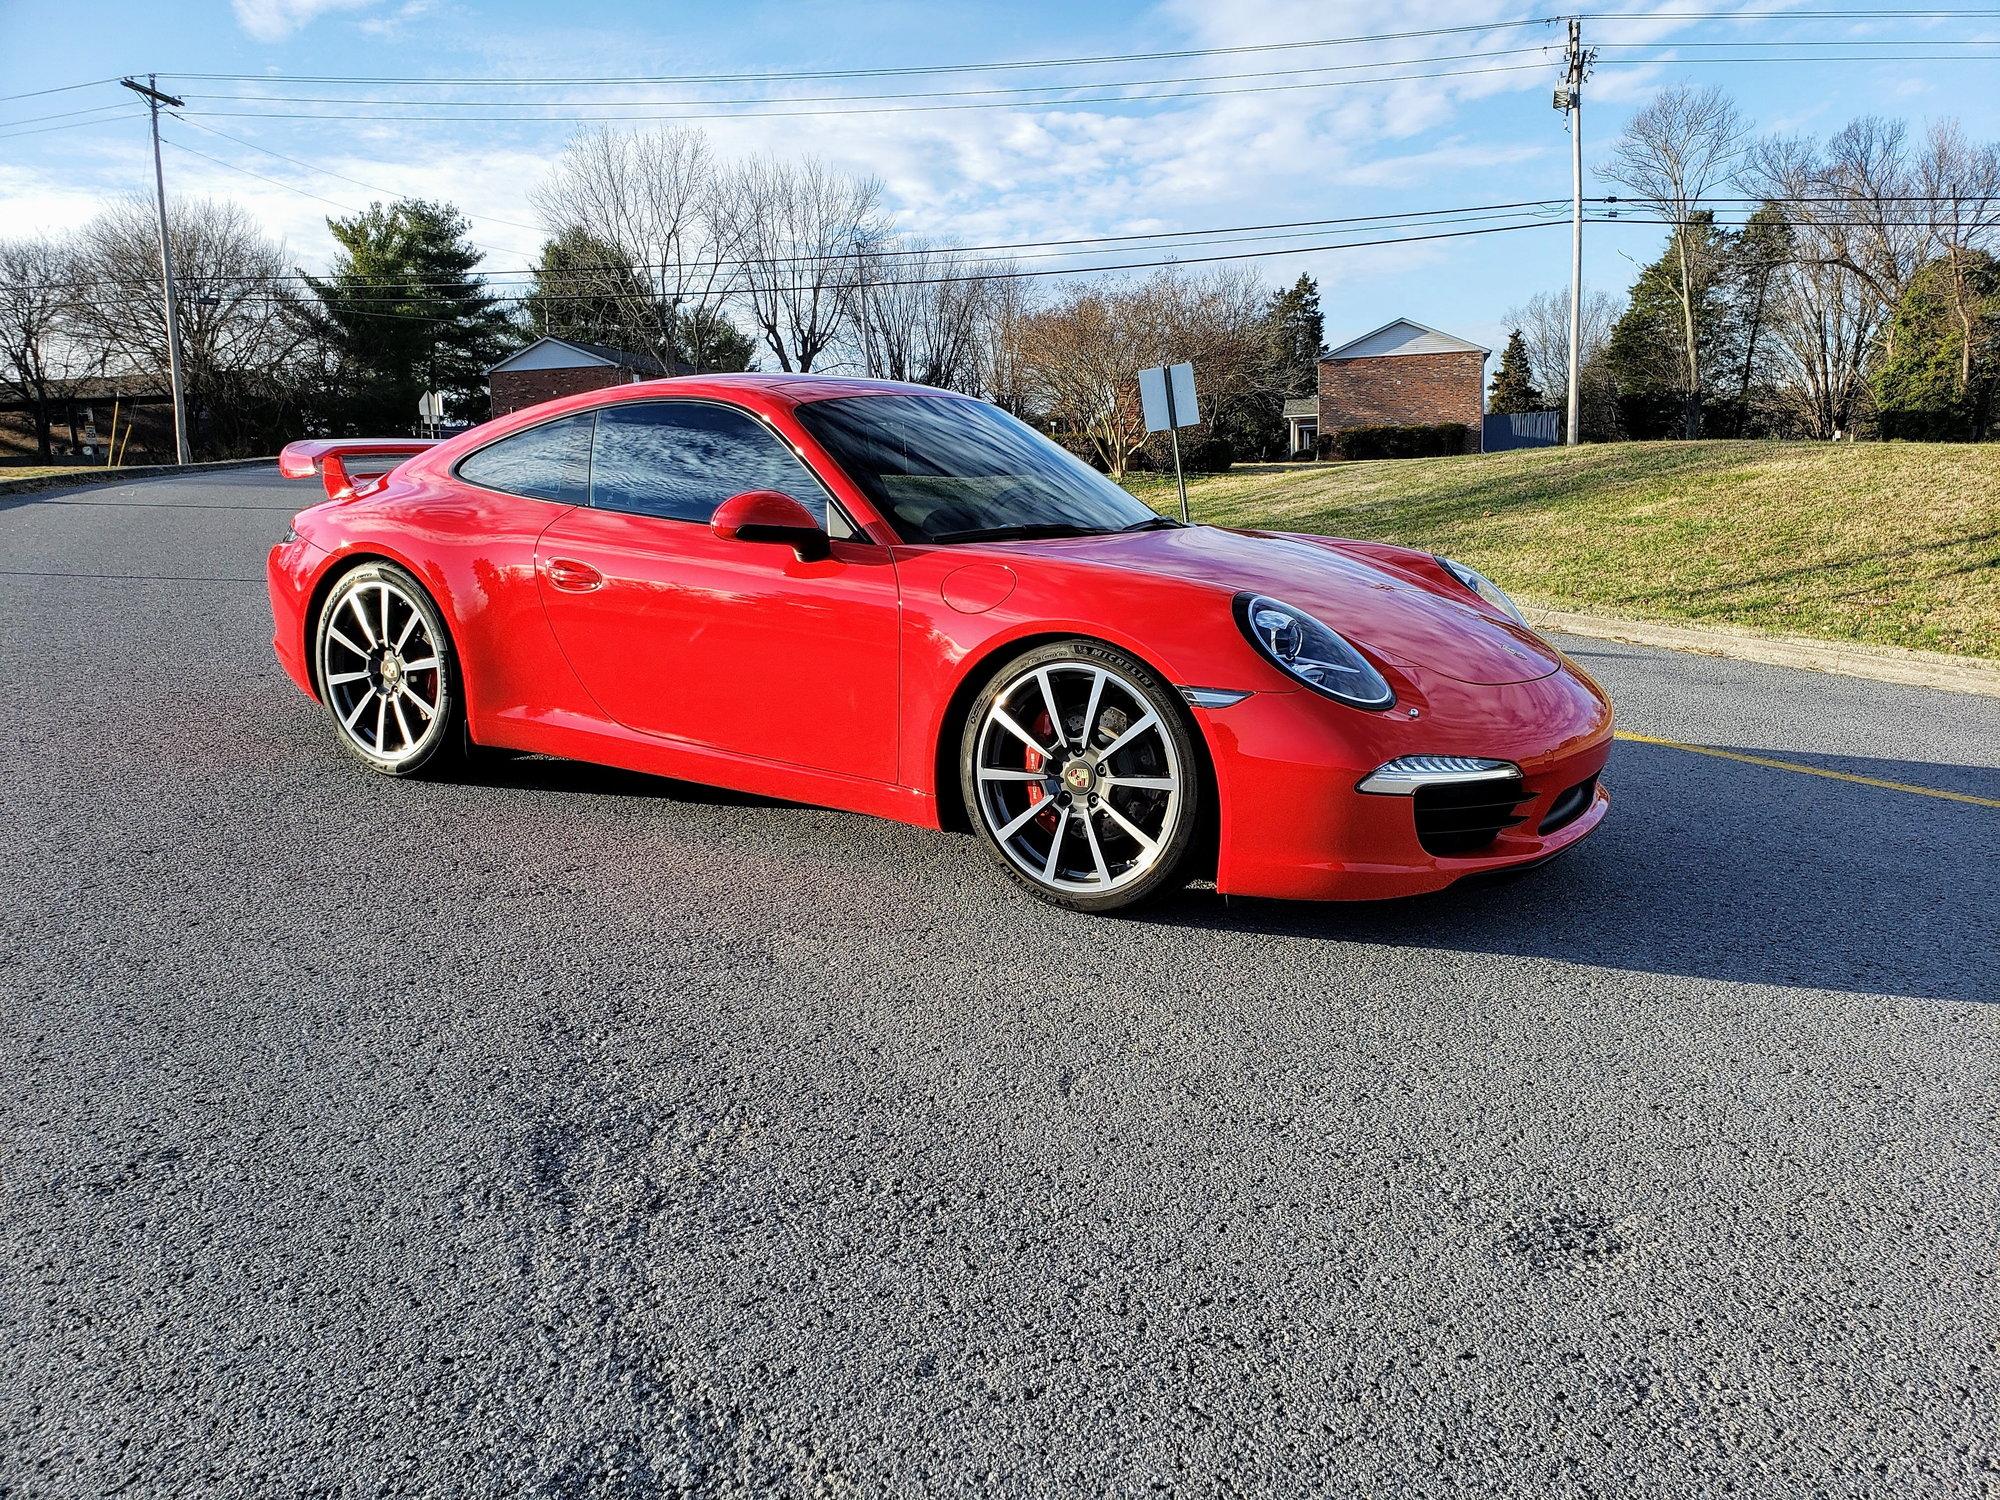 Dealer Inventory 2012 Porsche 991/911 Carrera S Guards Red - Soul